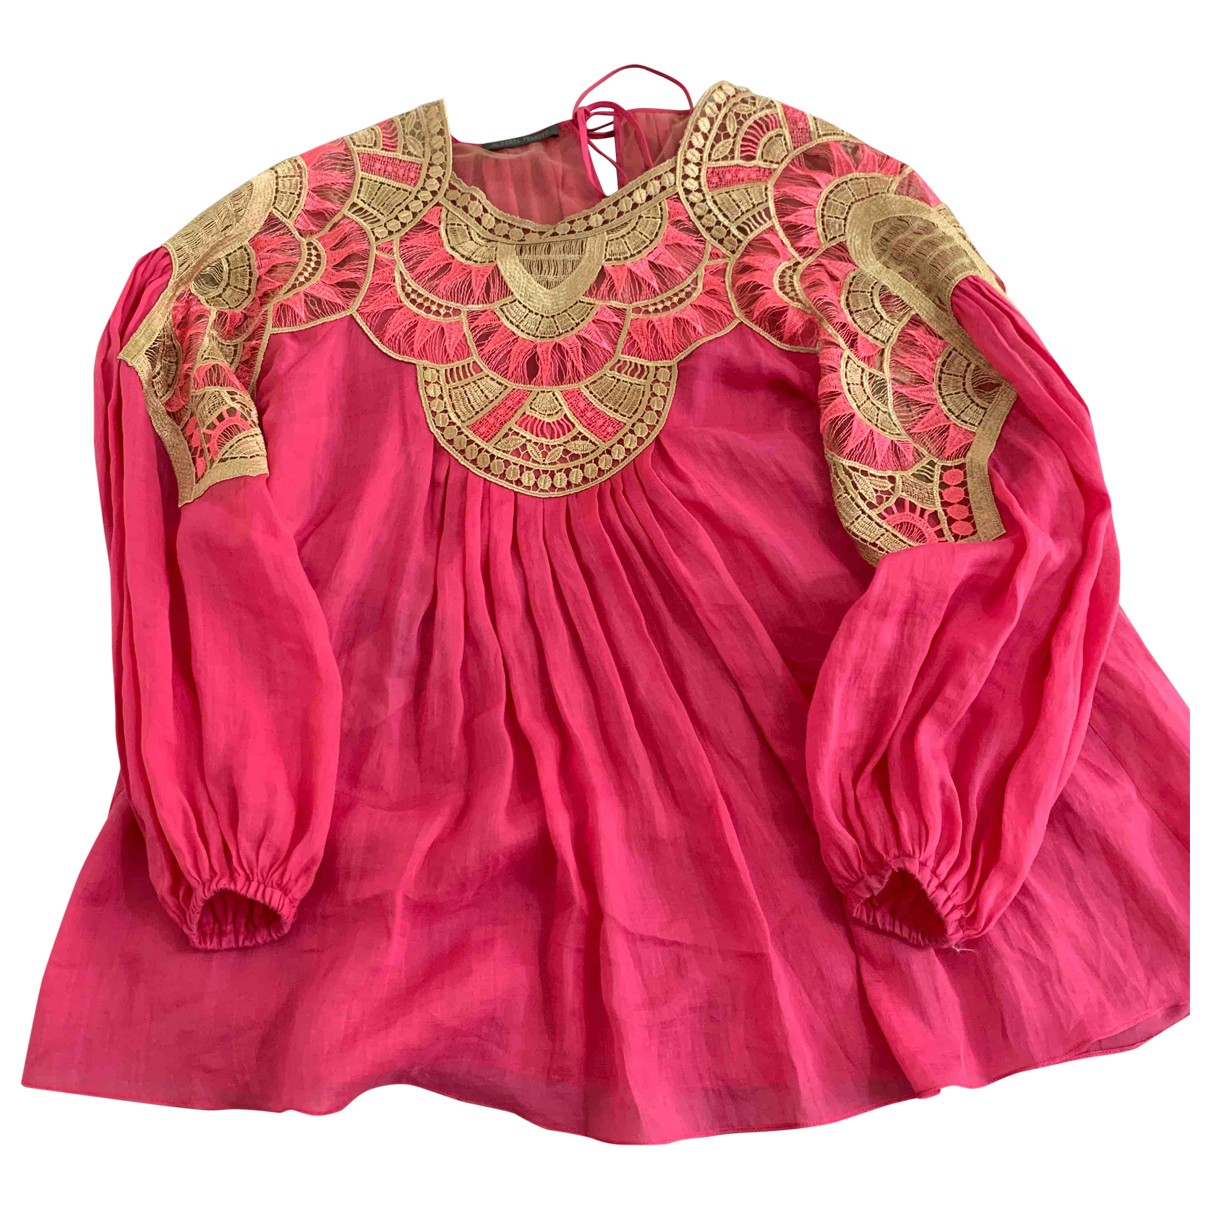 Alberta Ferretti - Robe   pour femme en lin - rose